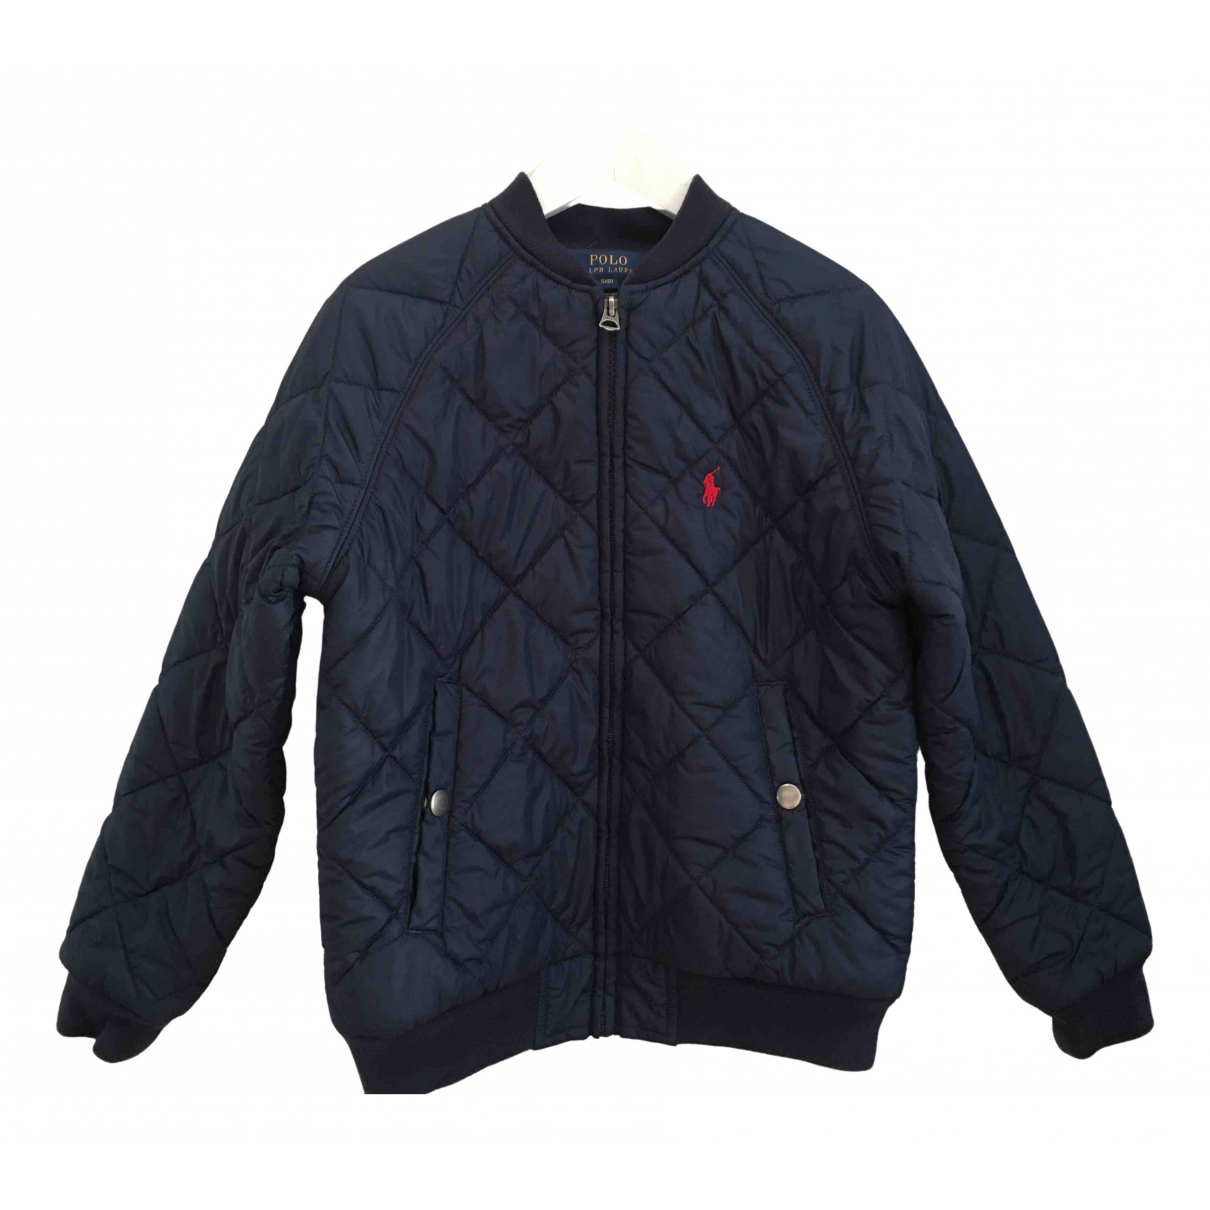 Polo Ralph Lauren \N Jacke, Maentel in  Blau Polyester